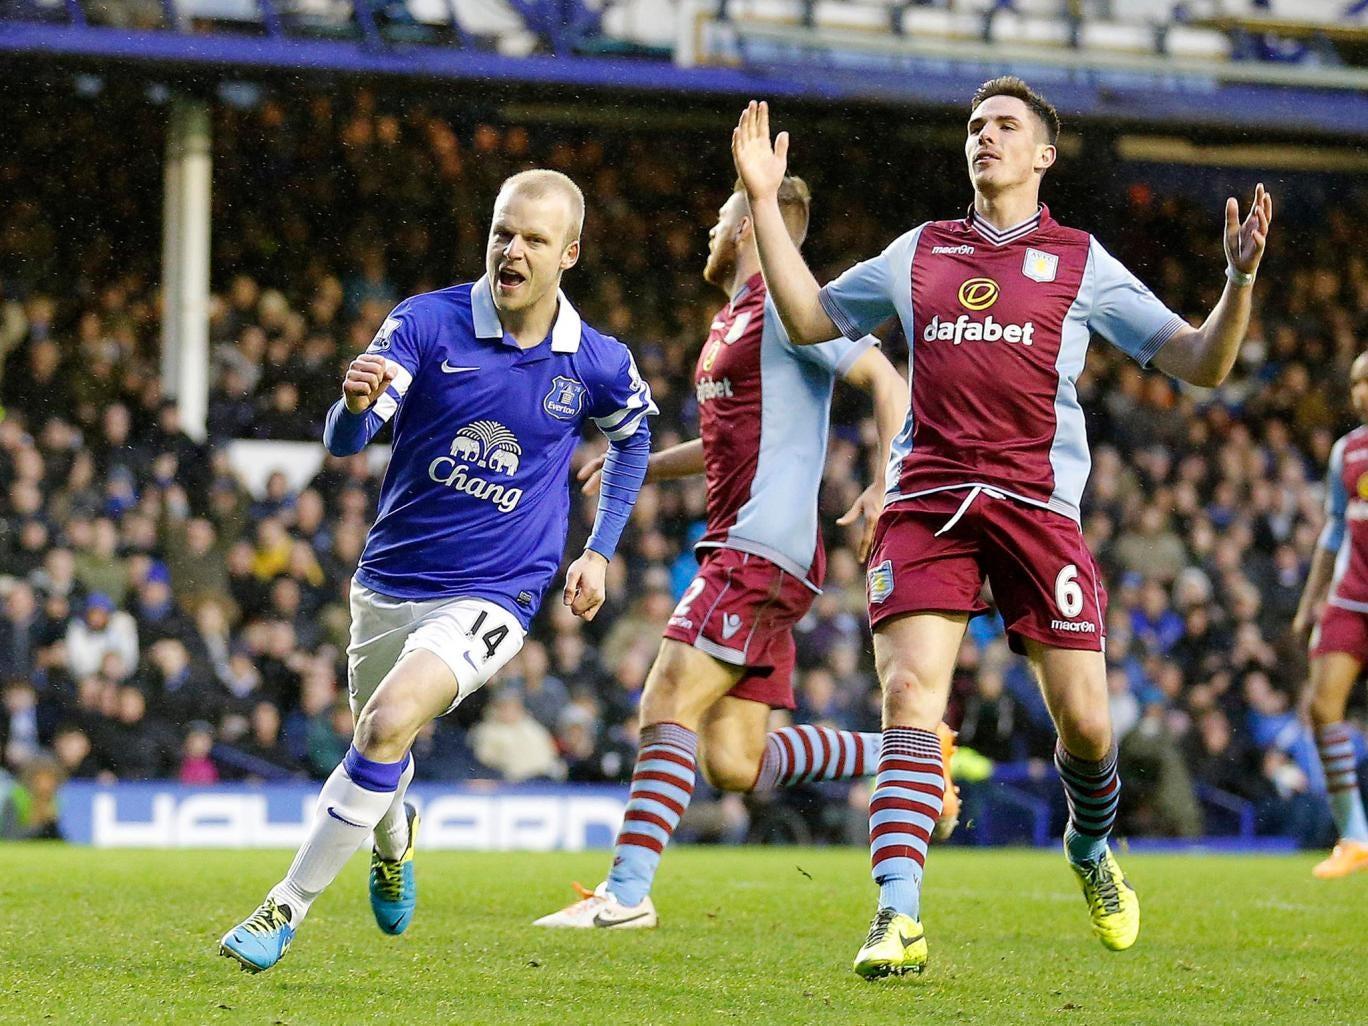 Steven Naismith scores for Everton against Aston Villa